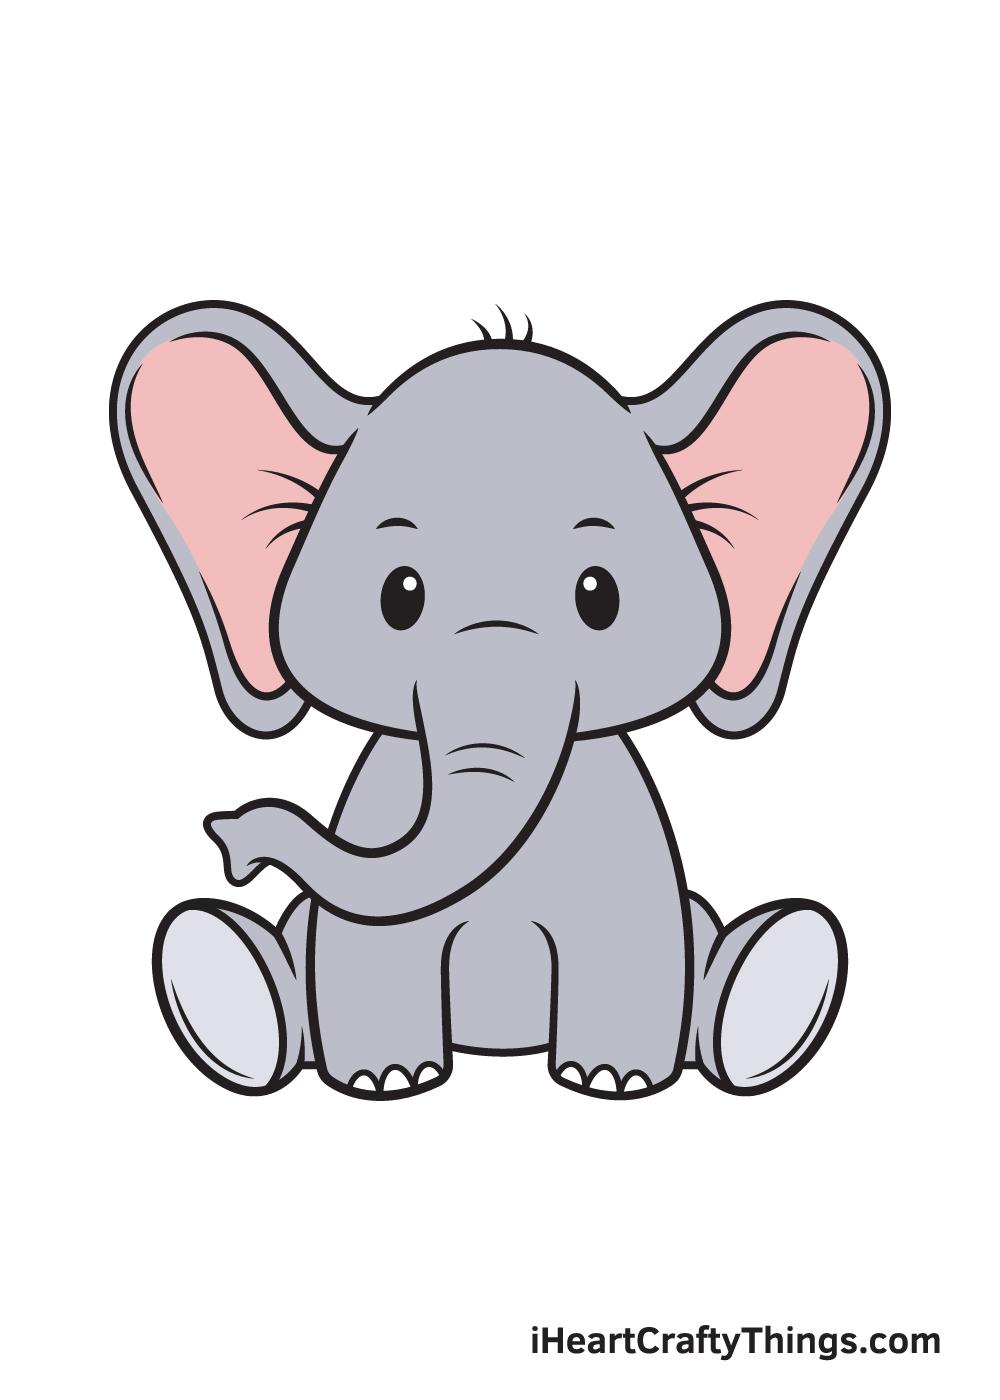 Vẽ voi - 9 bước